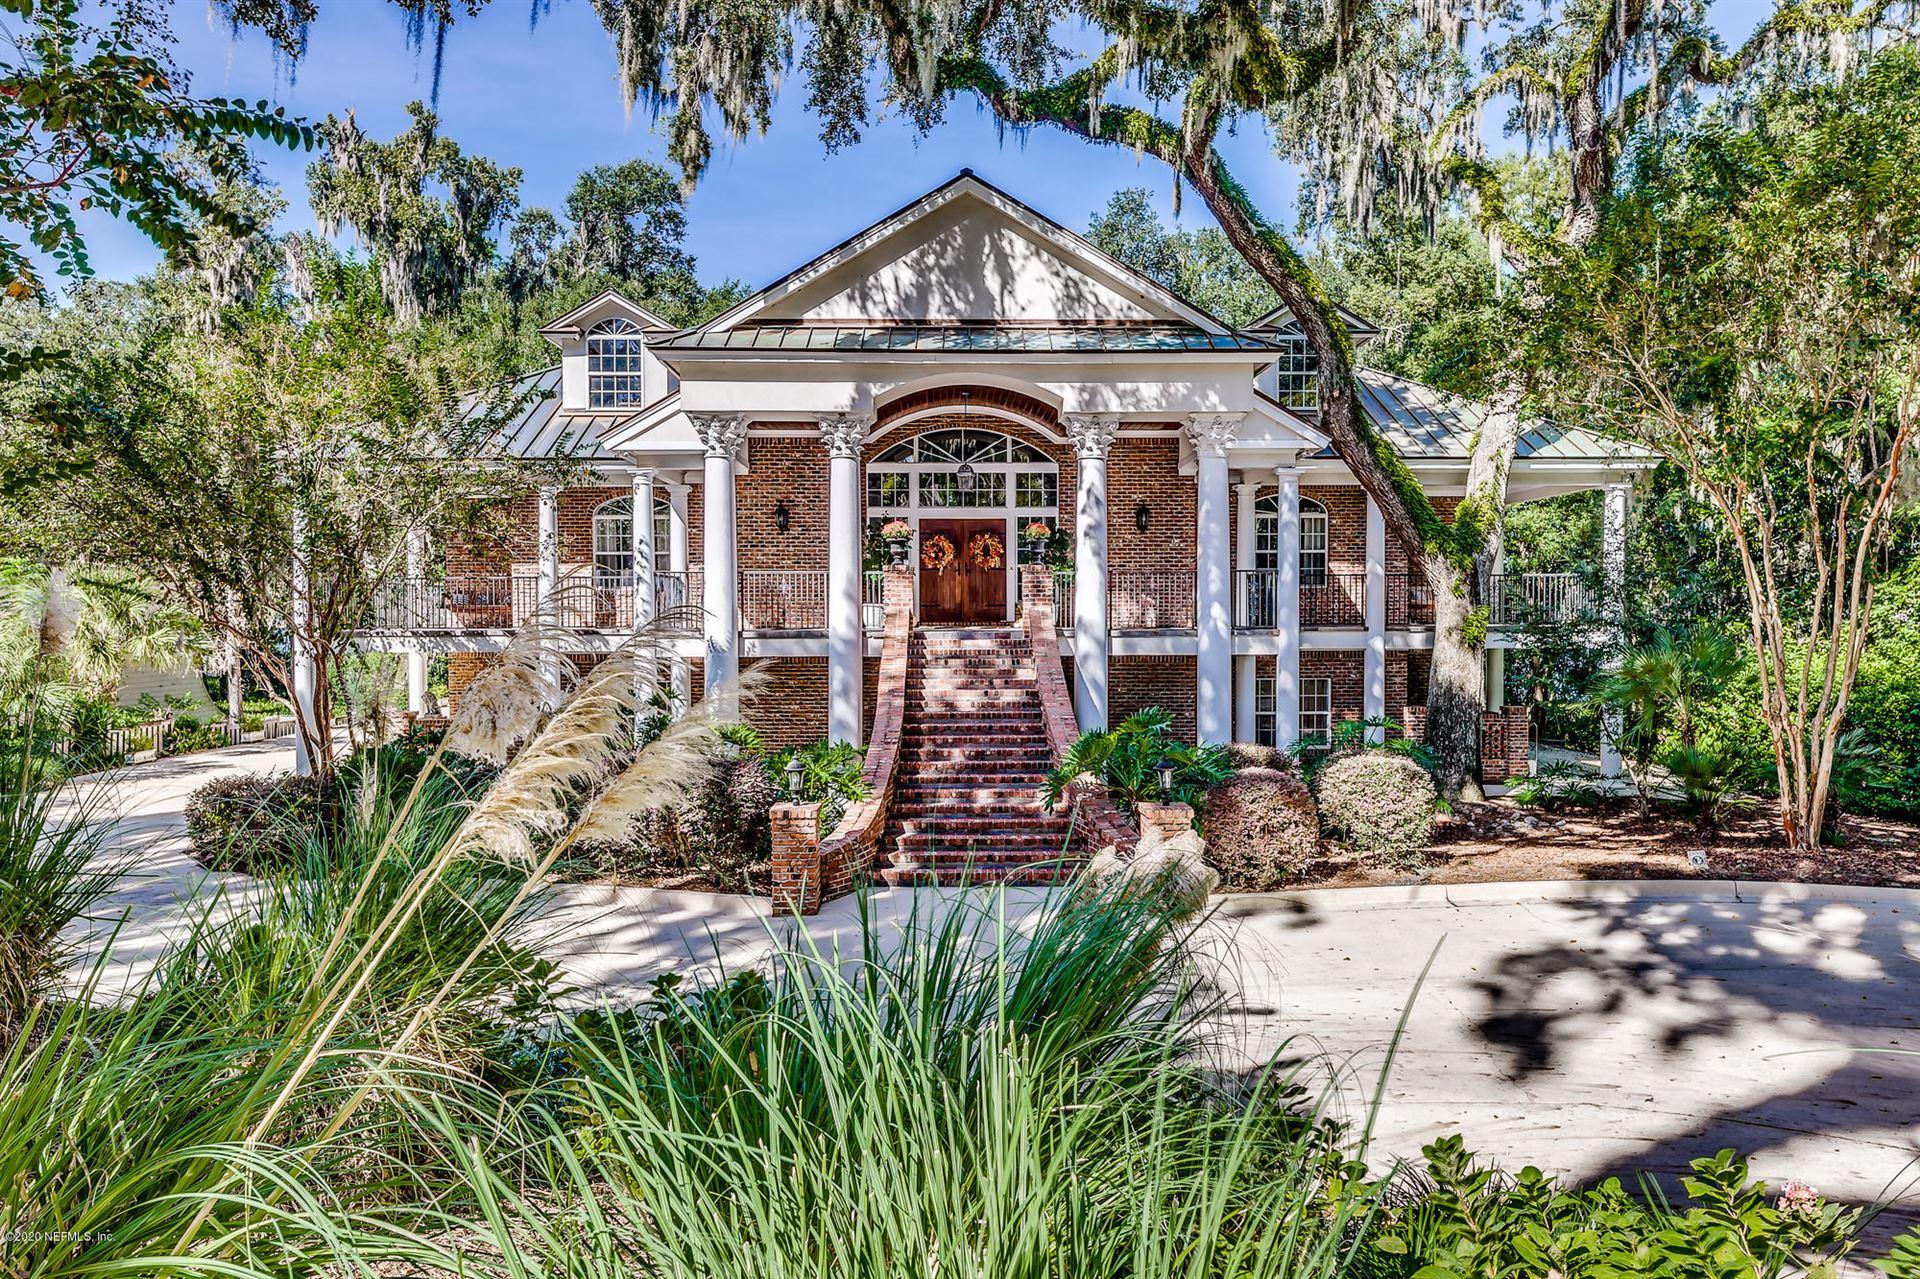 4200 ORTEGA FOREST DR, Jacksonville, FL 32210 - MLS#: 1037198